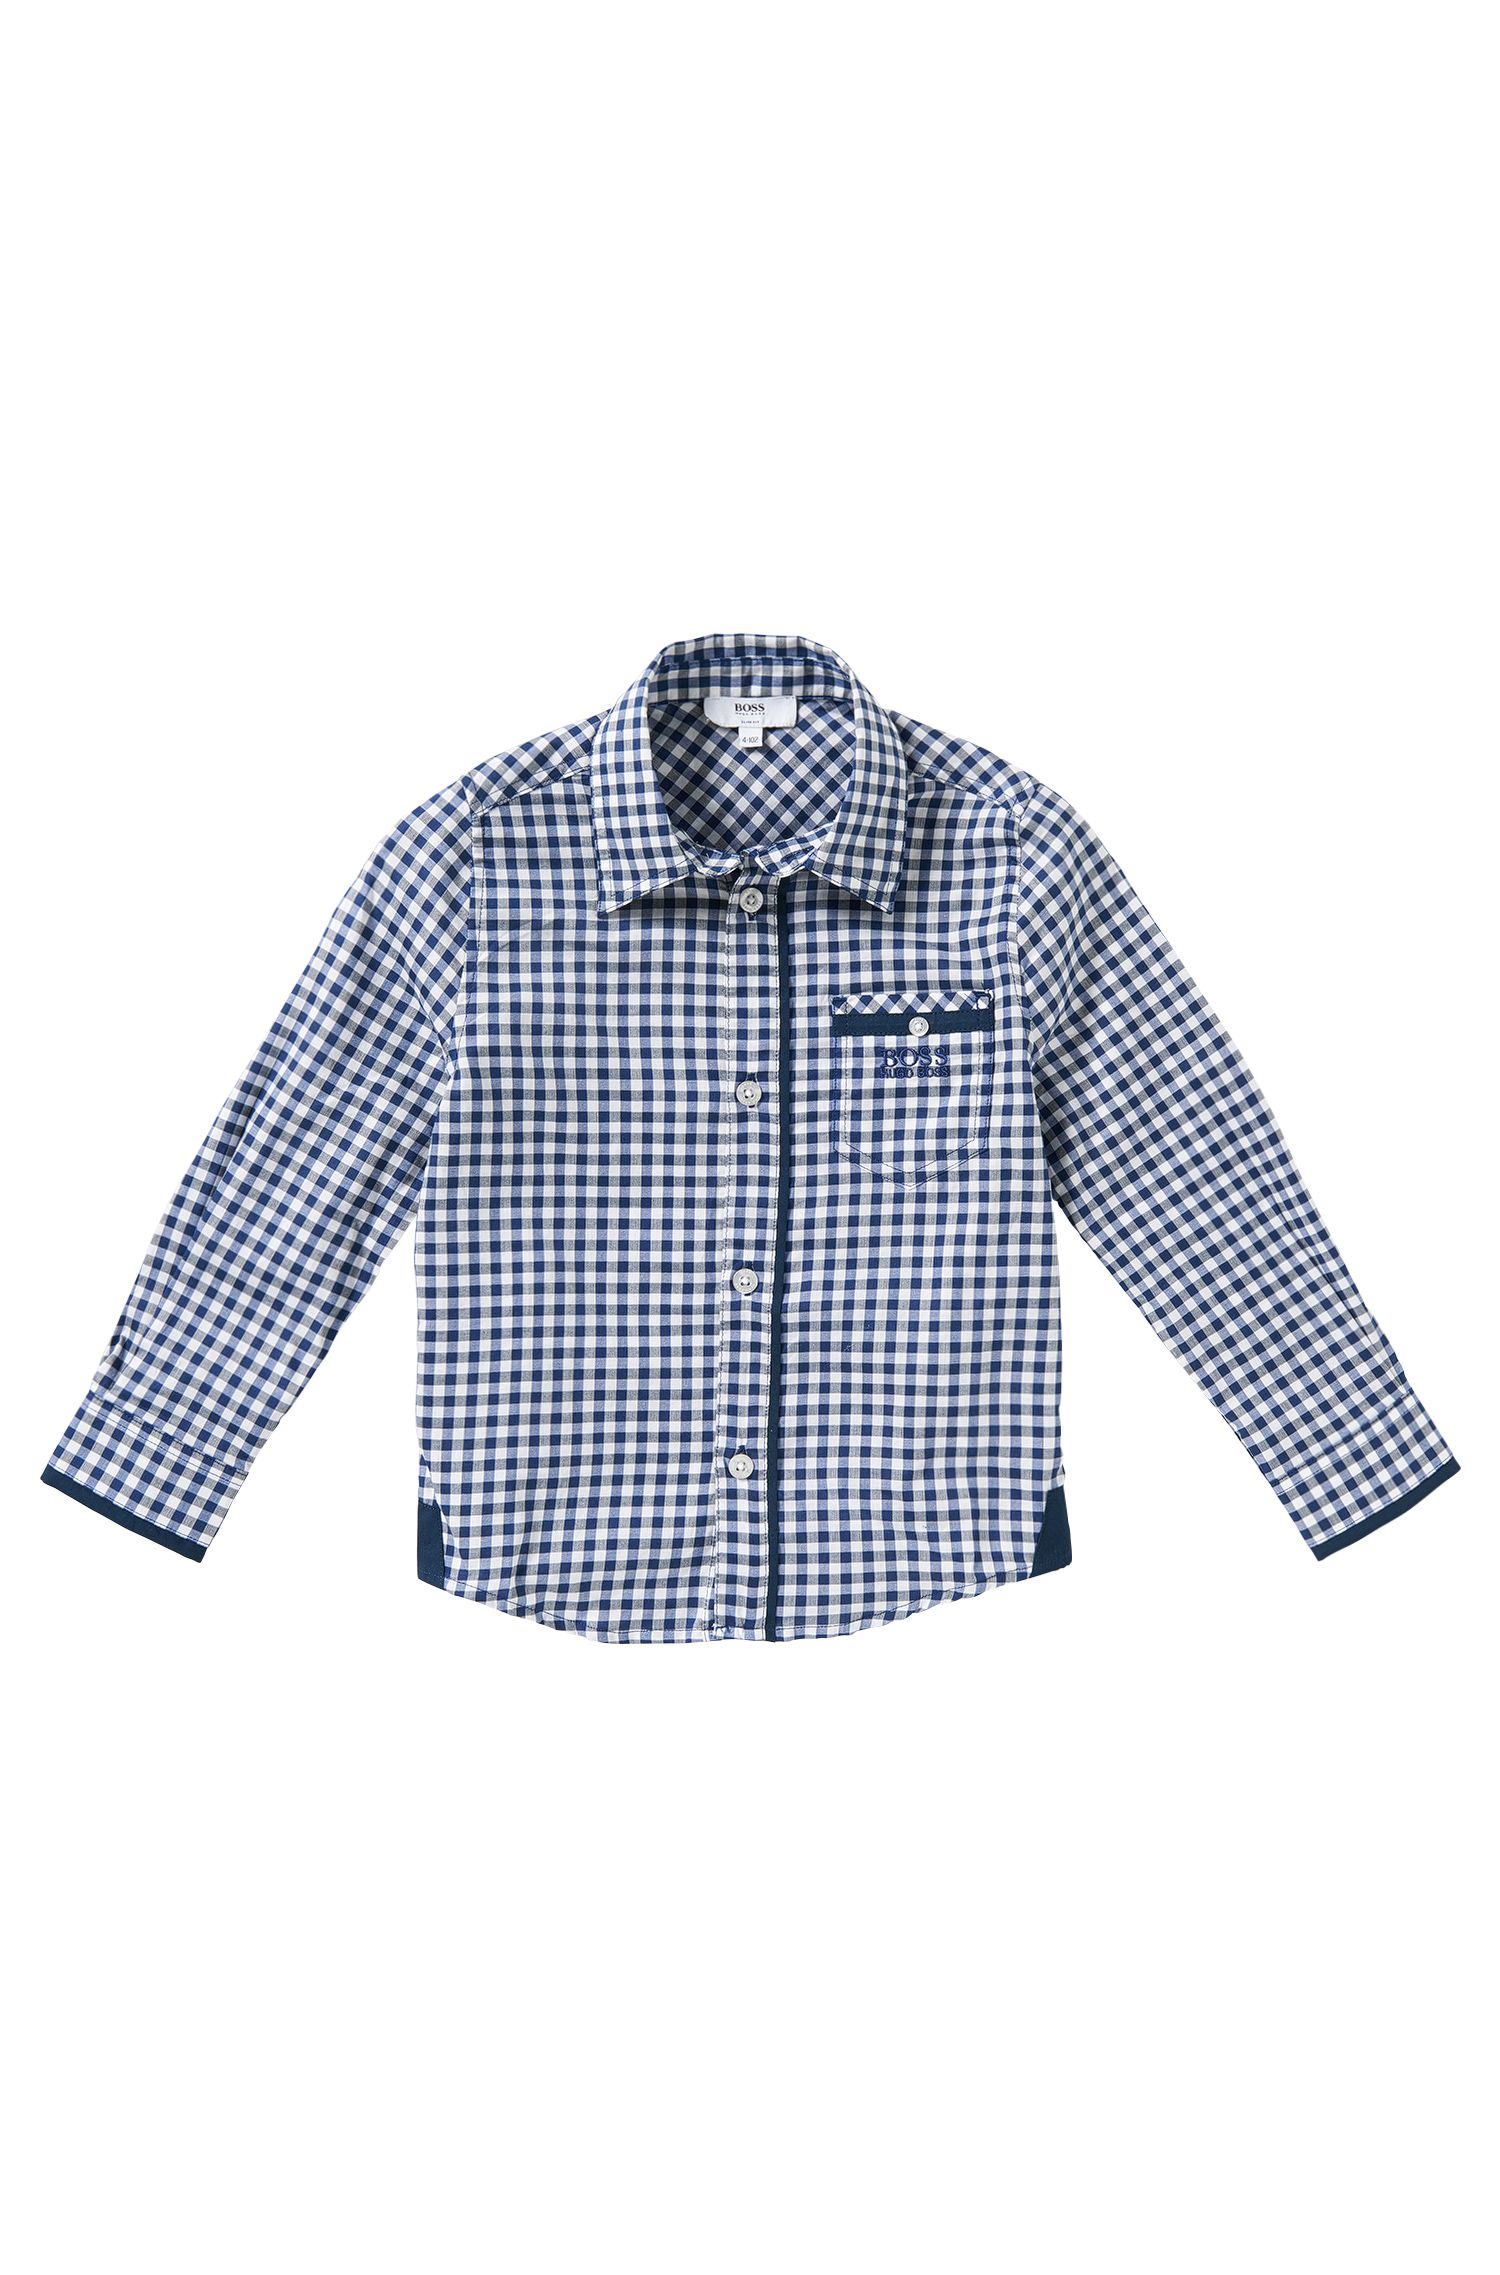 Kinderoverhemd van katoen: 'J25869'